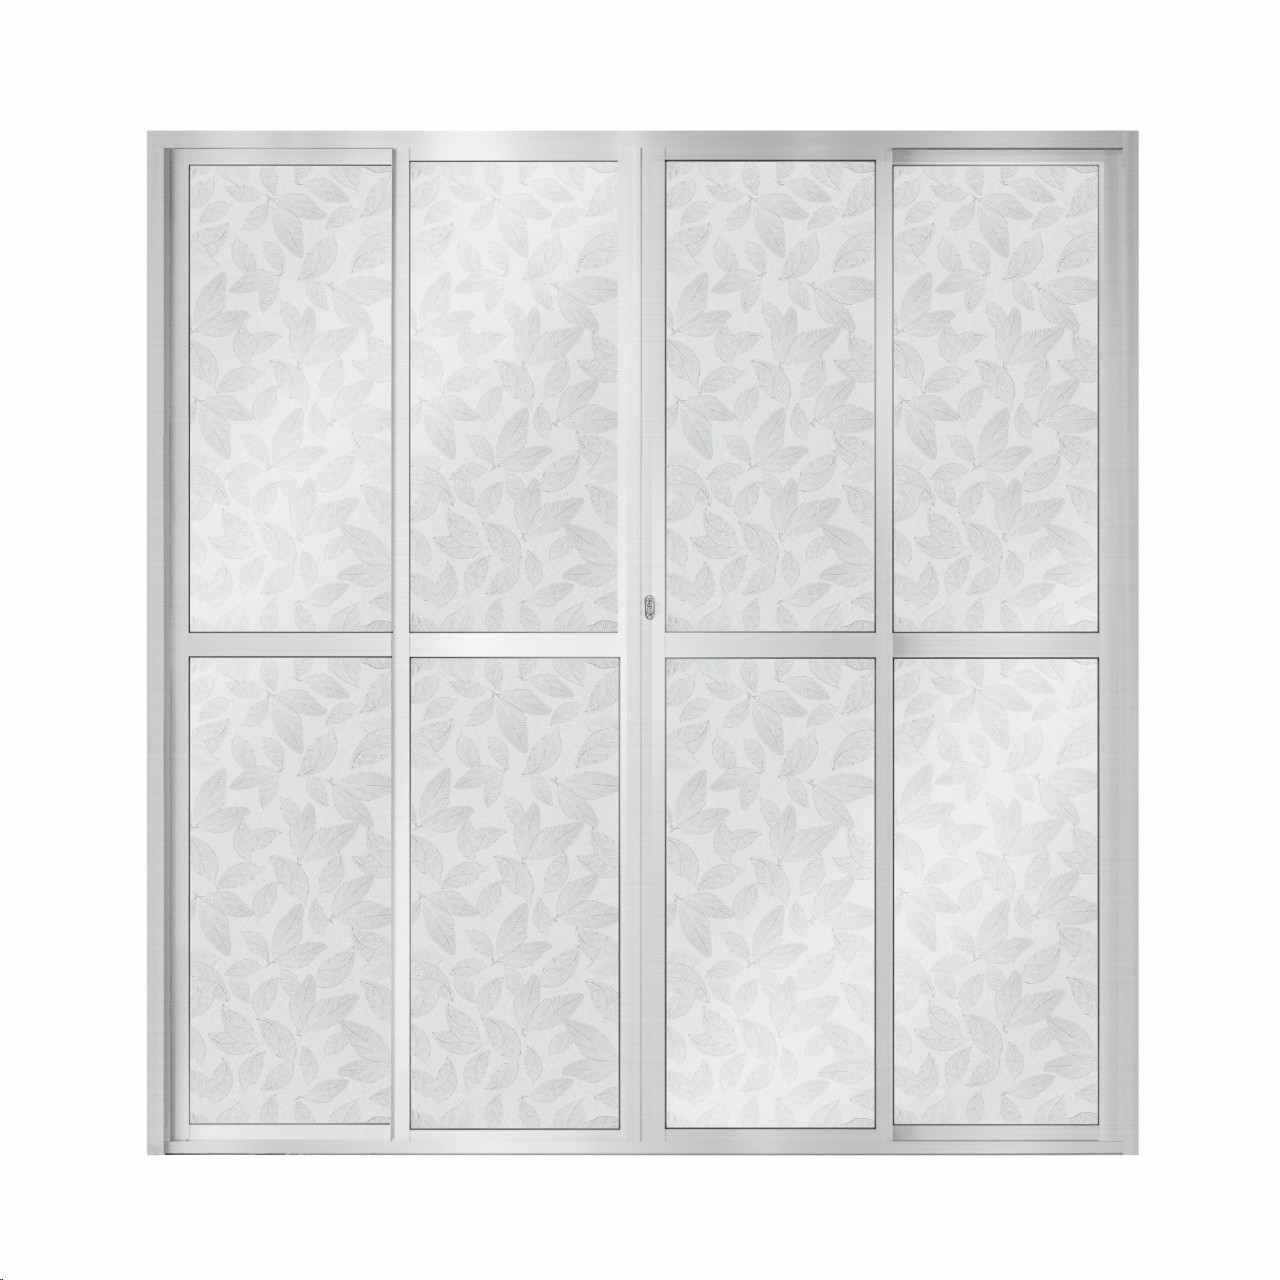 Porta Balcao de Aluminio 4 Folhas 210x200cm Cinza - 921907 - Aluvid